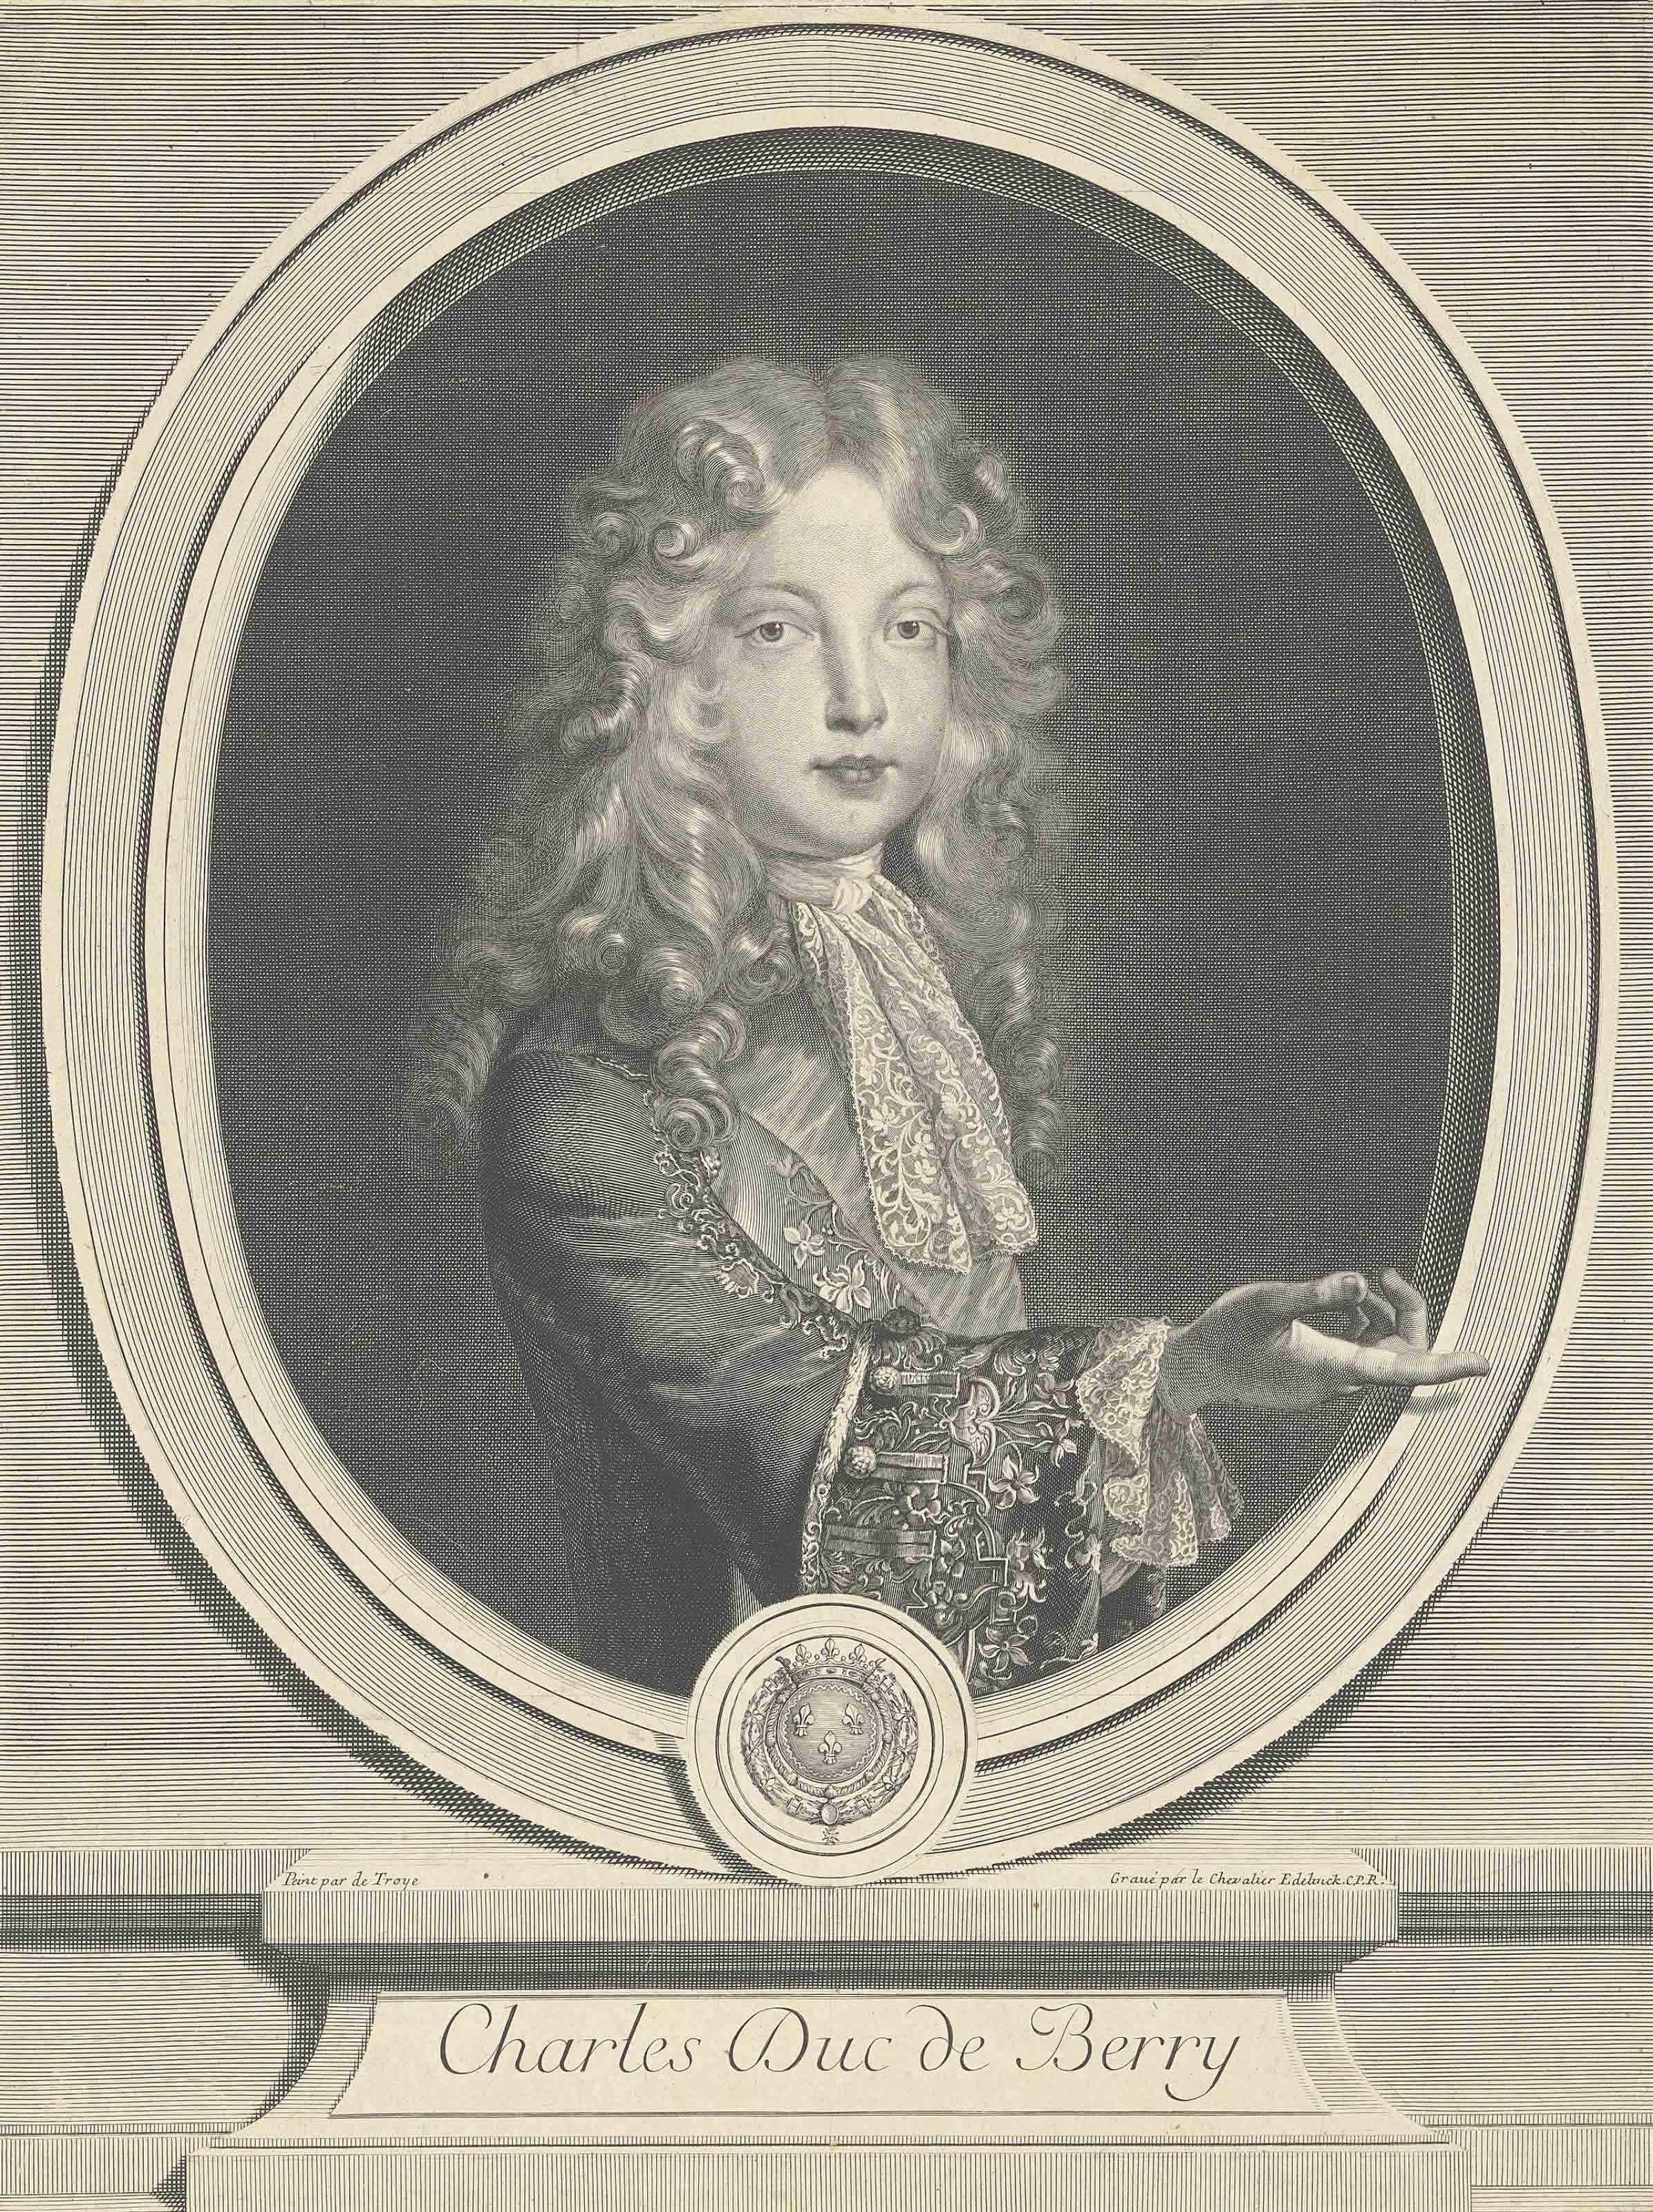 Gerard Edelinck (1640-1707)